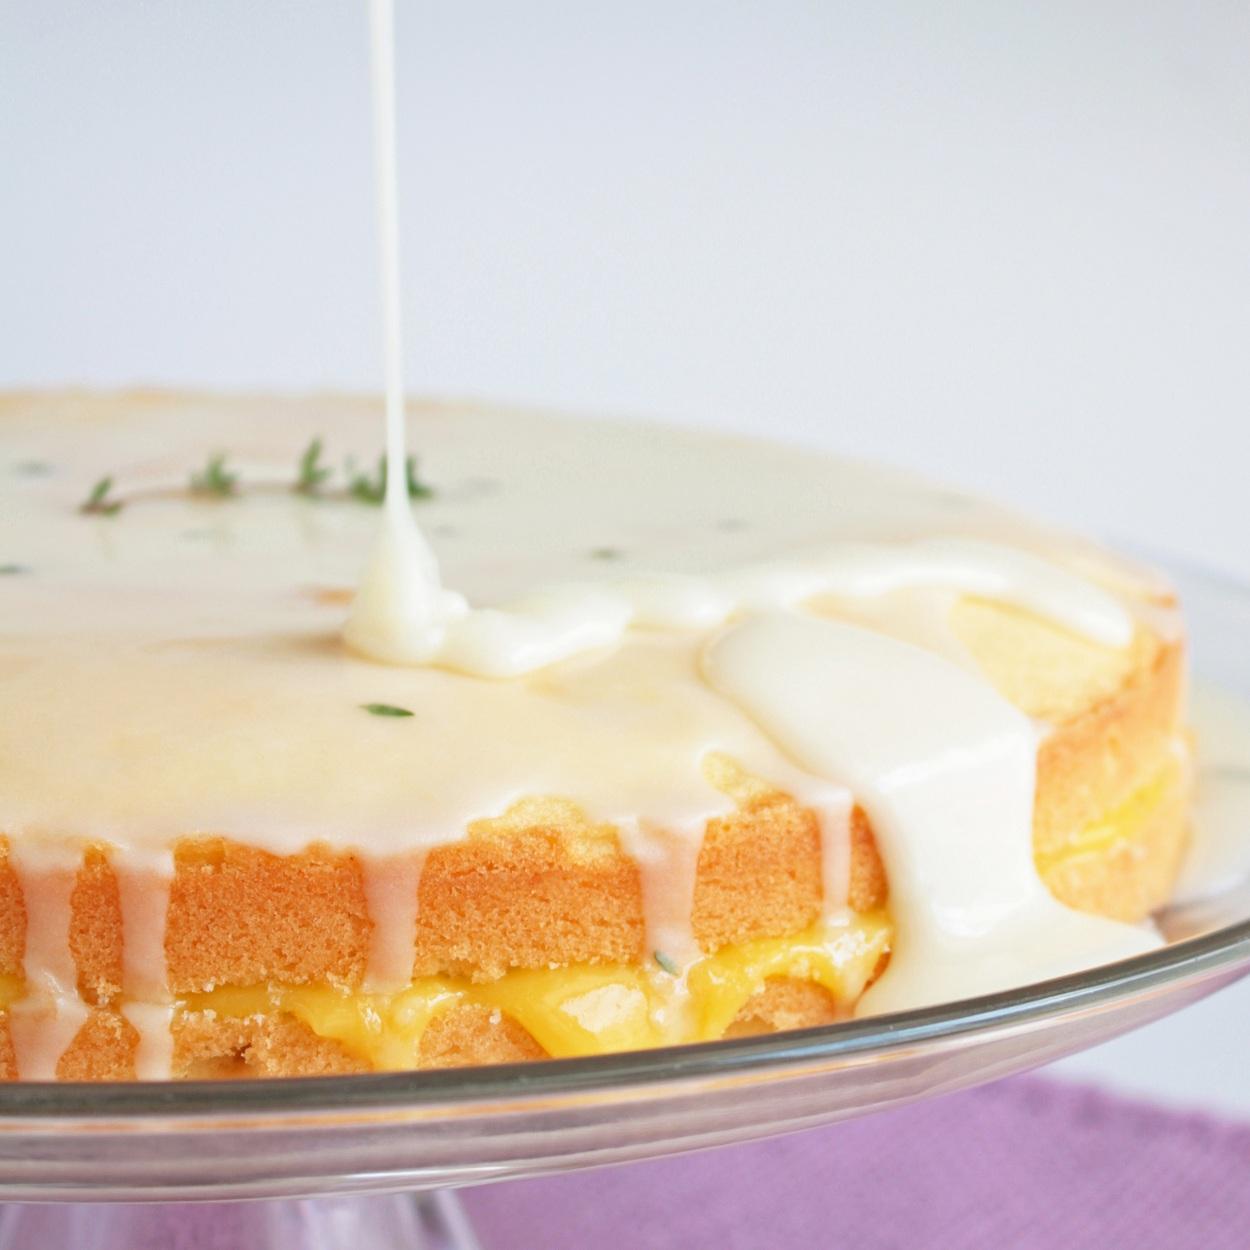 Lemon Olive Oil And Almond Cake You Tube